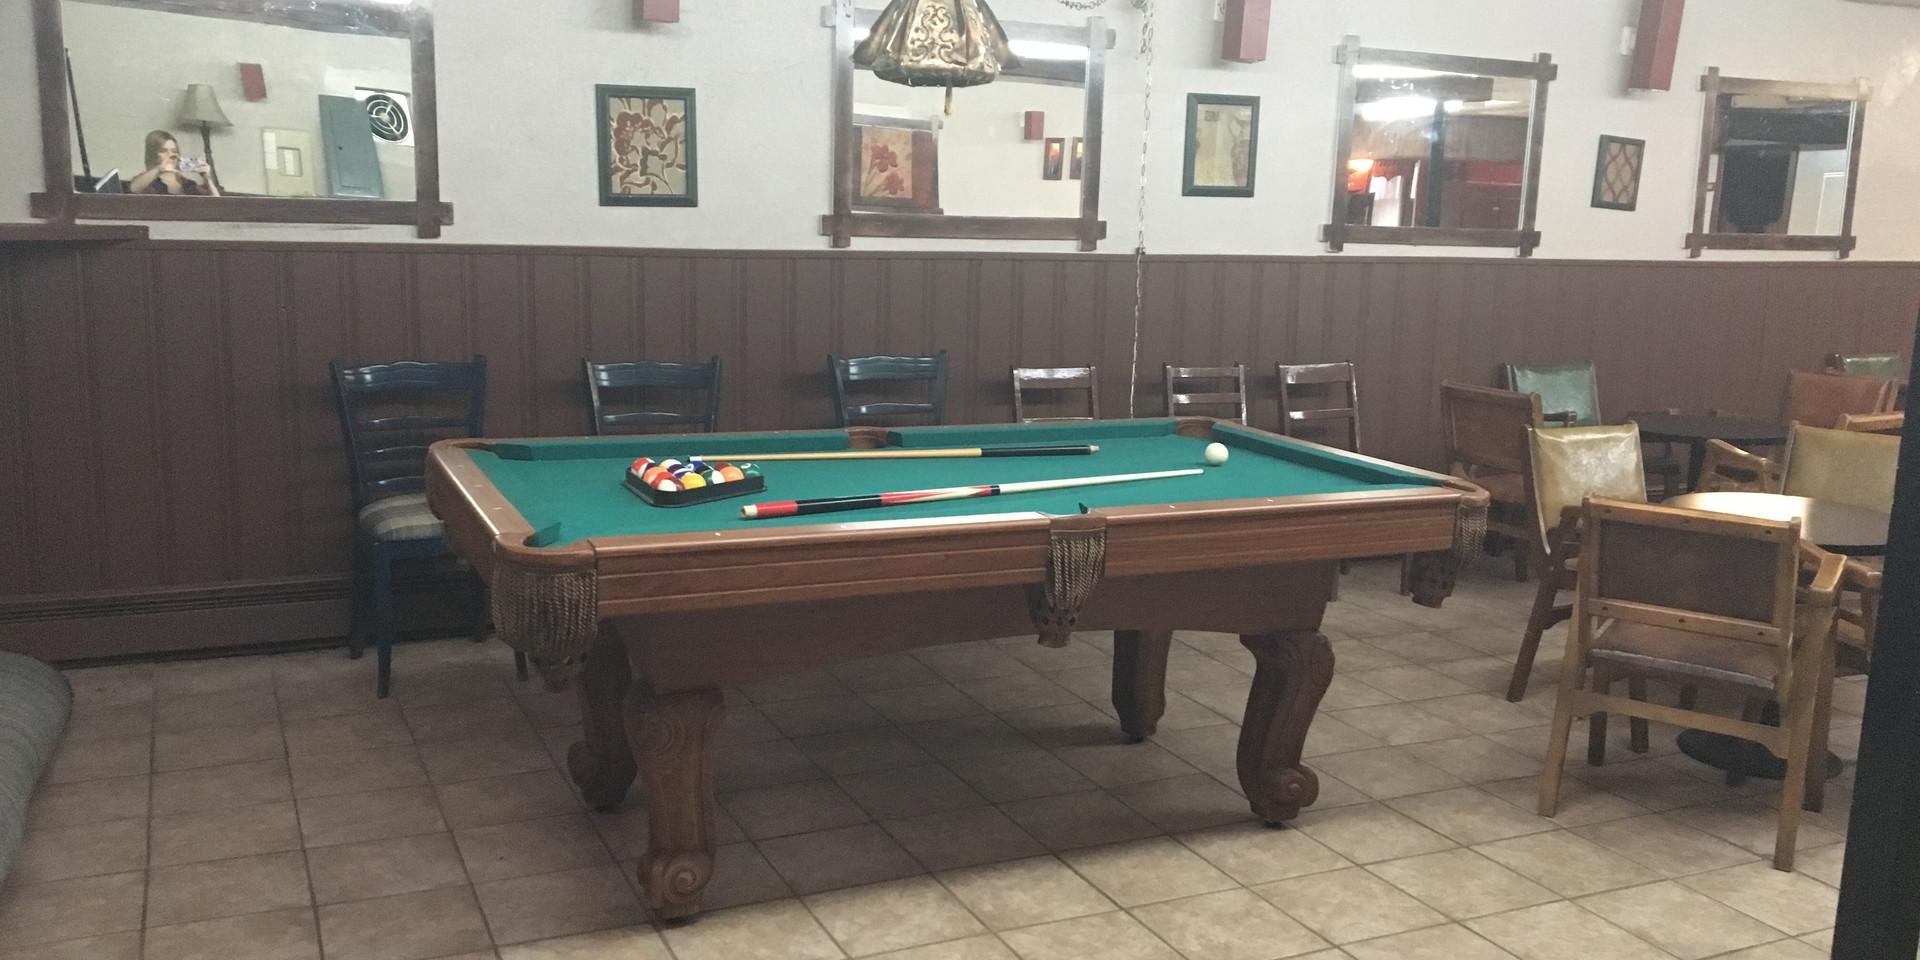 Grande salle, table de pool, jukebok et bar